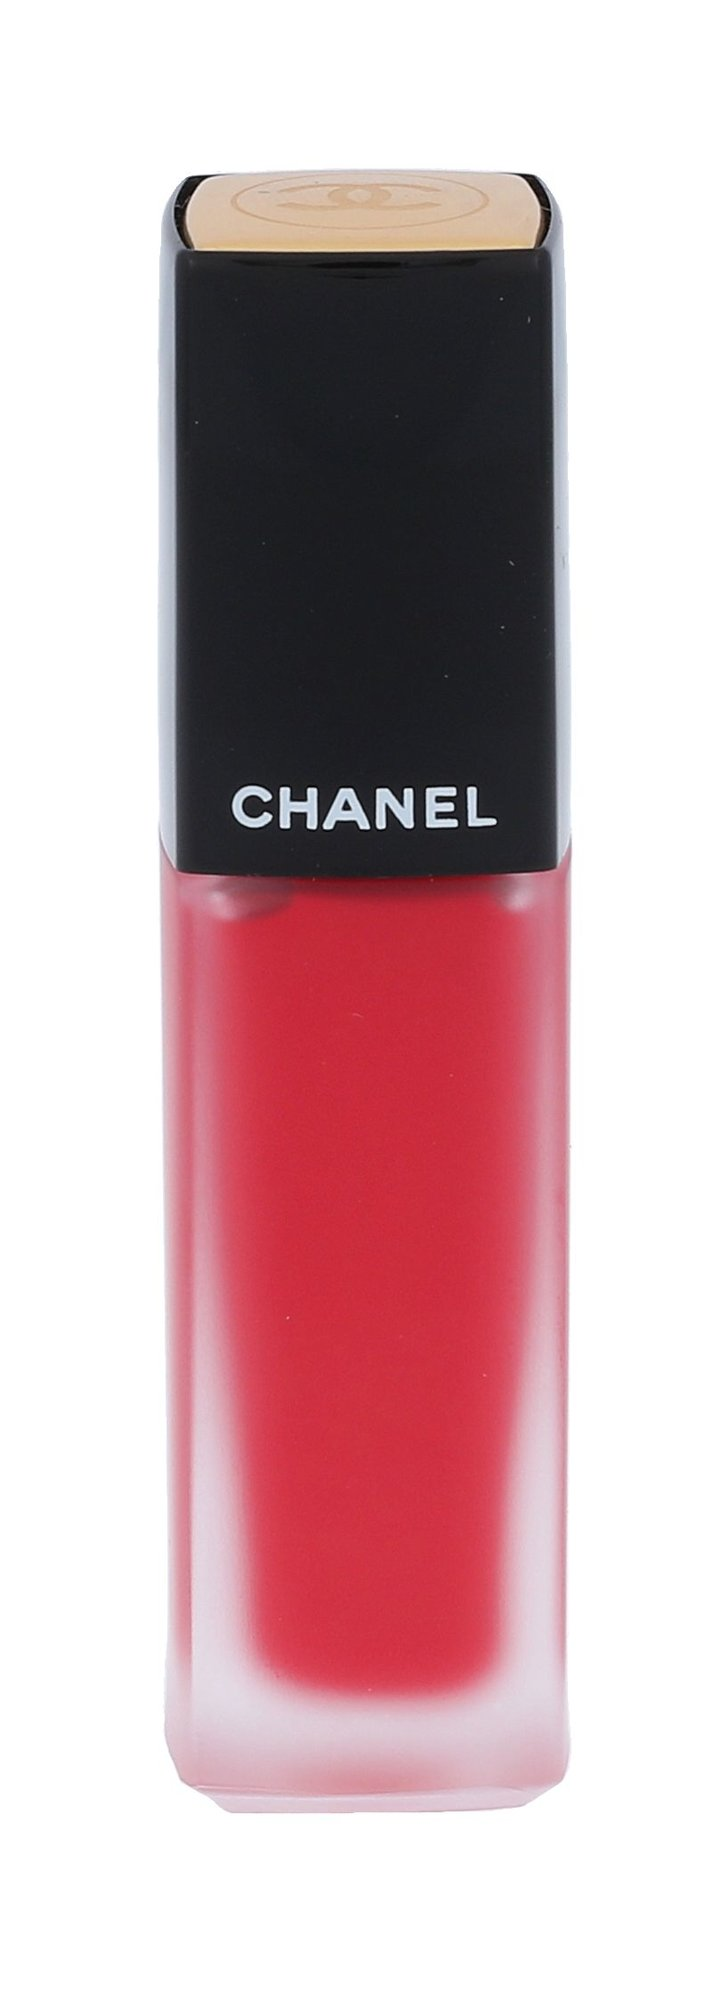 Chanel Rouge Allure Cosmetic 6ml 146 Séduisant